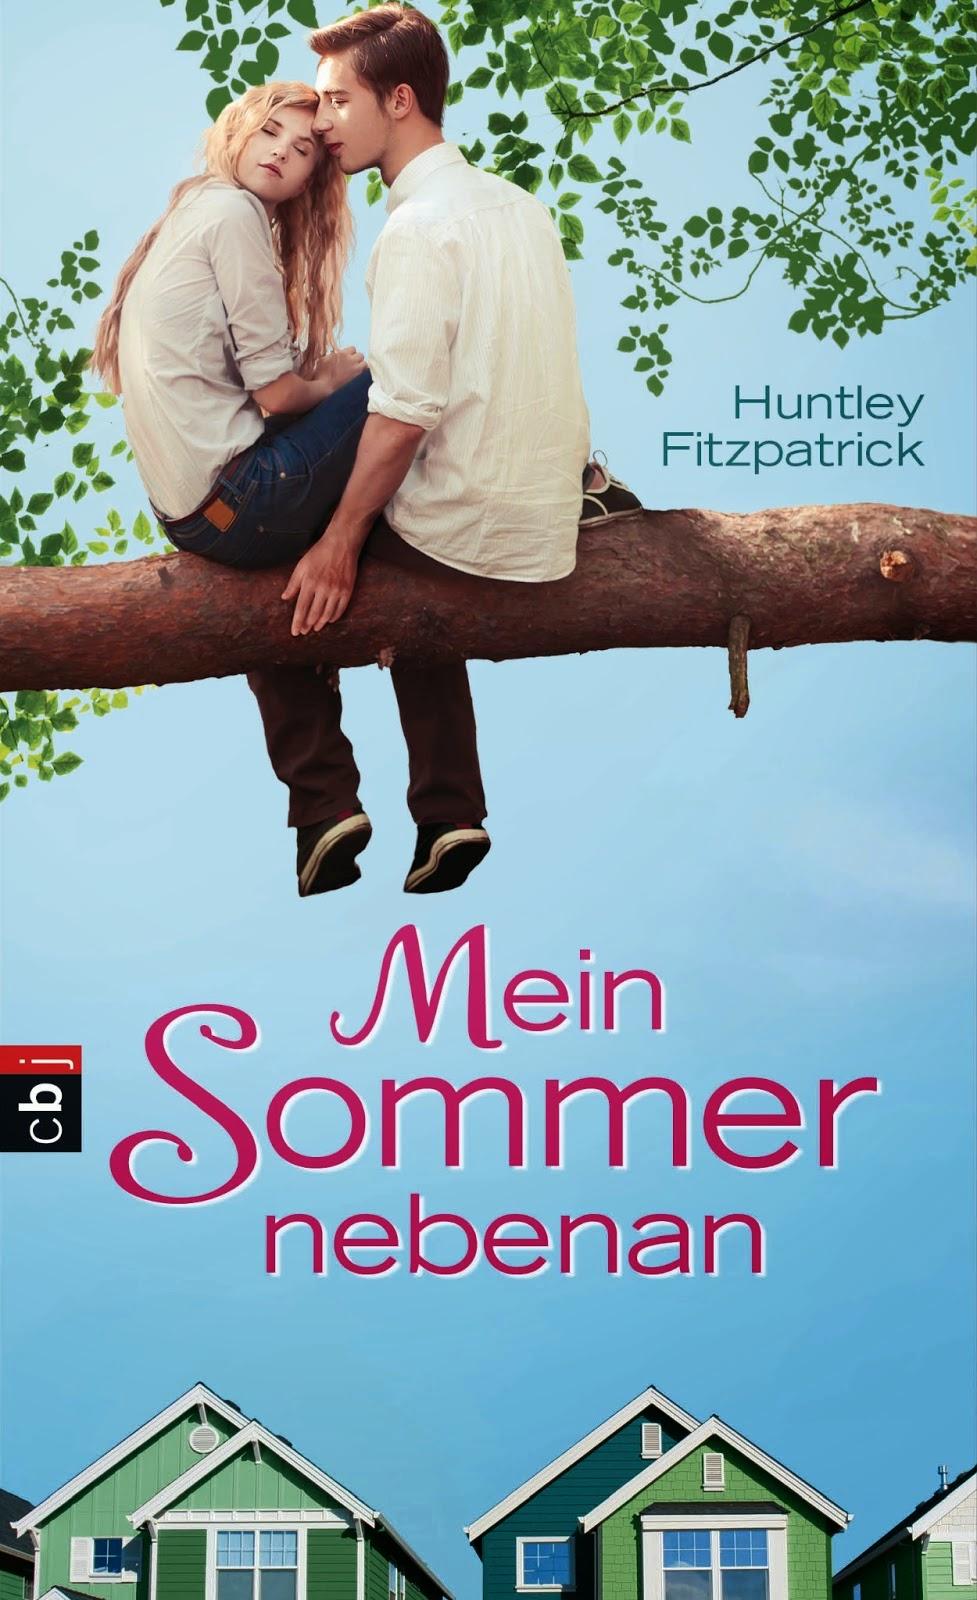 http://www.amazon.de/Mein-Sommer-nebenan-Huntley-Fitzpatrick/dp/3570155722/ref=sr_1_1?ie=UTF8&qid=1401115443&sr=8-1&keywords=mein+sommer+nebenan